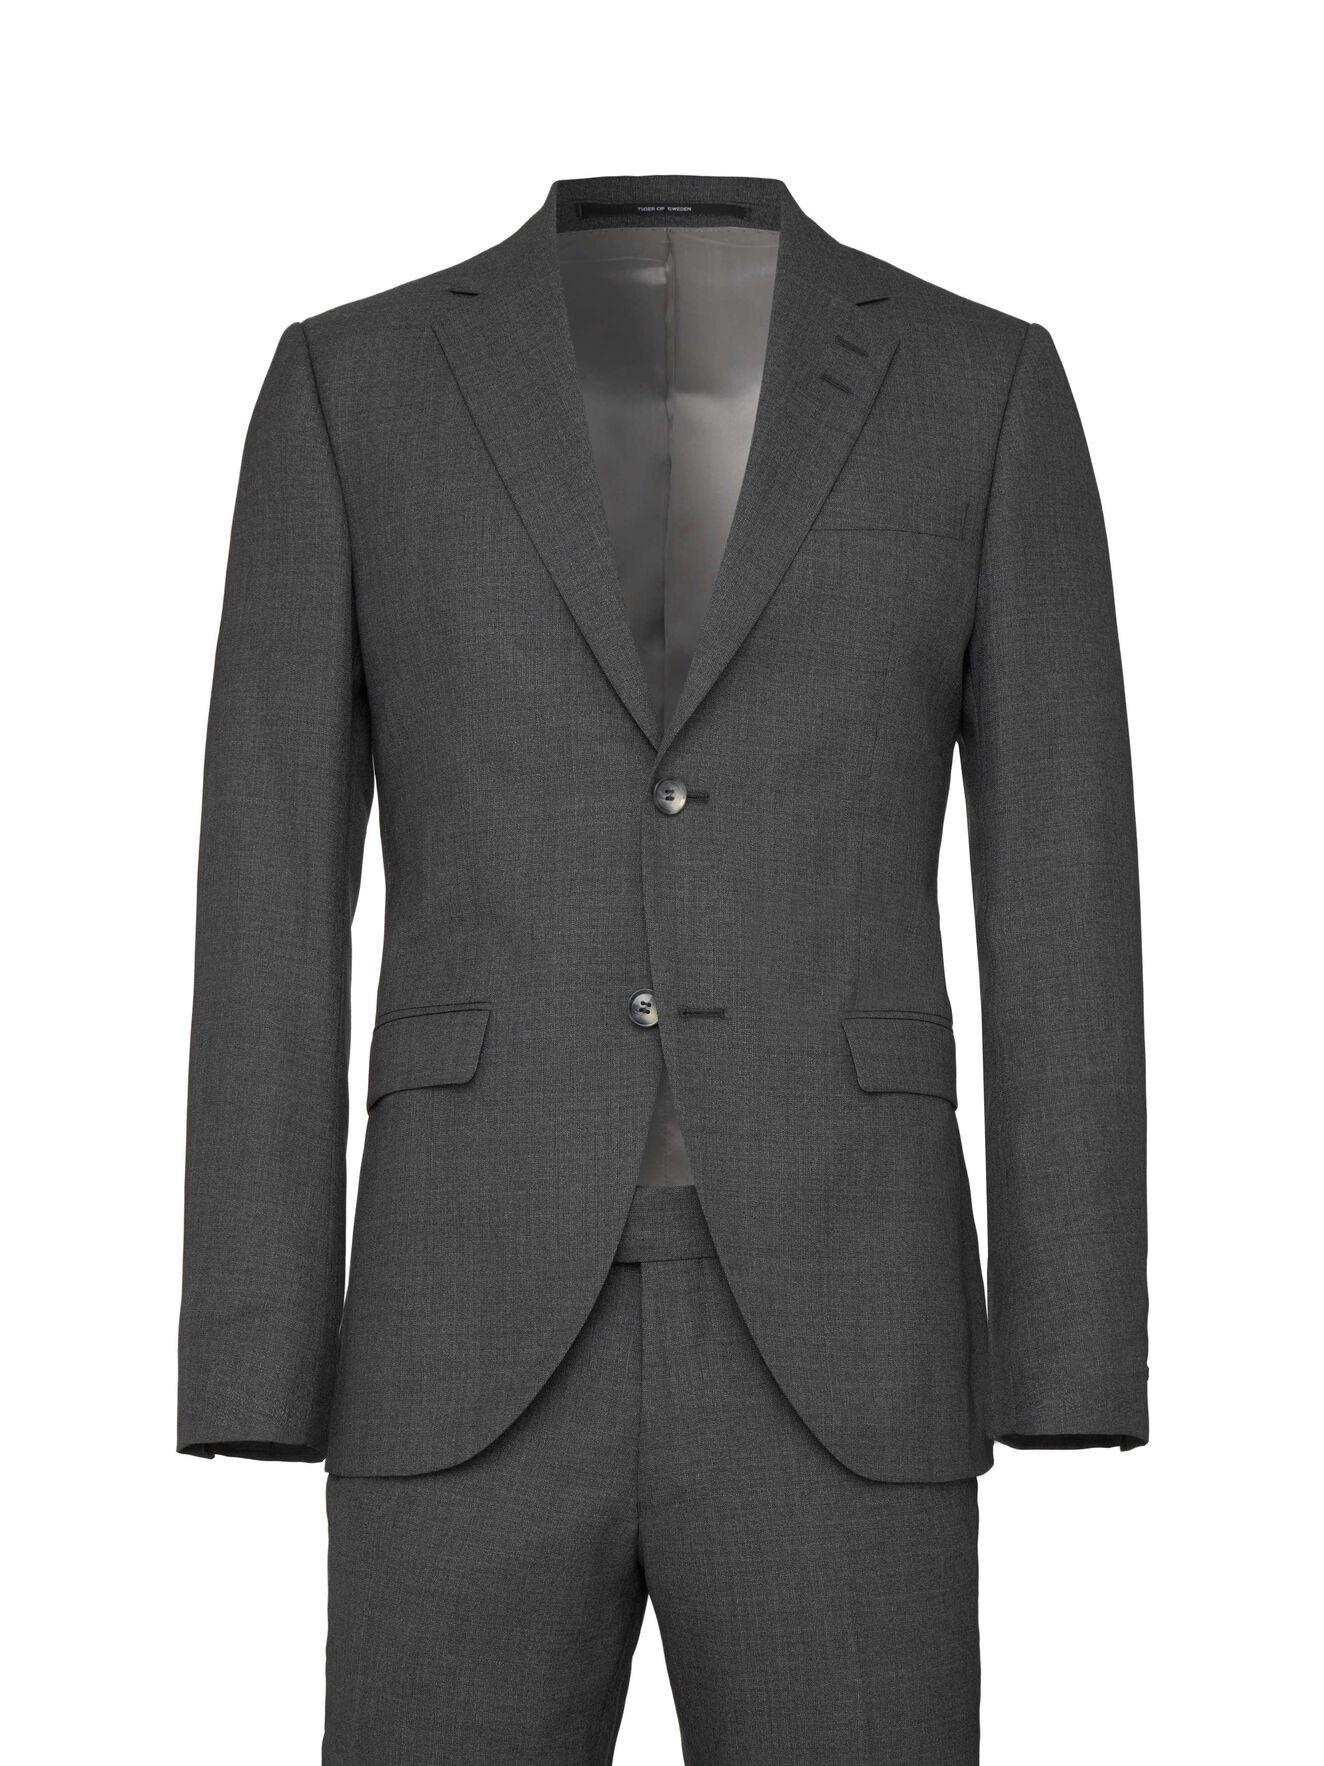 Lamonte Suit in Antarctica from Tiger of Sweden